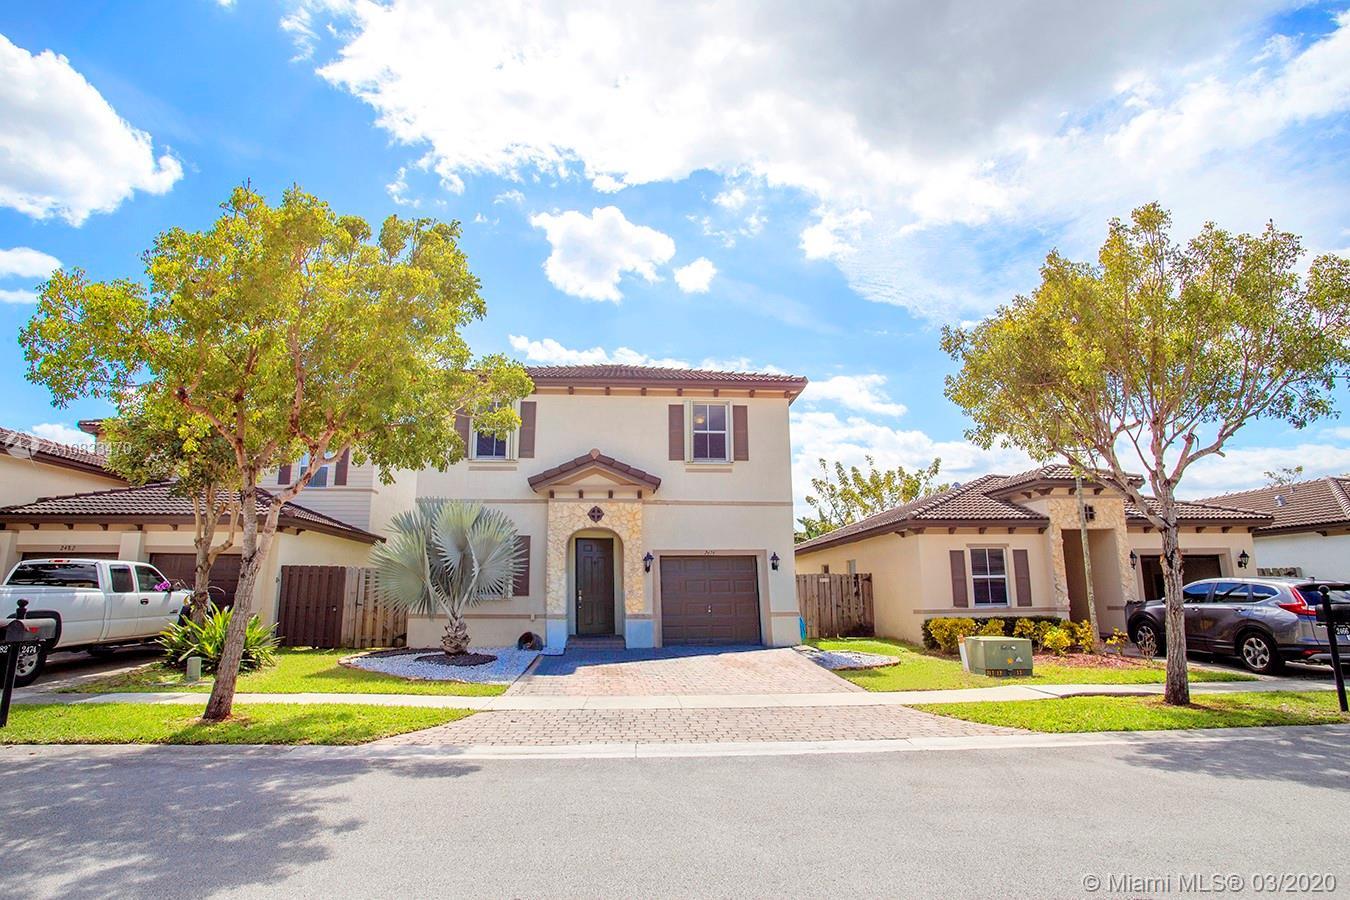 2474 NE 4th St, Homestead, FL 33033 - Homestead, FL real estate listing